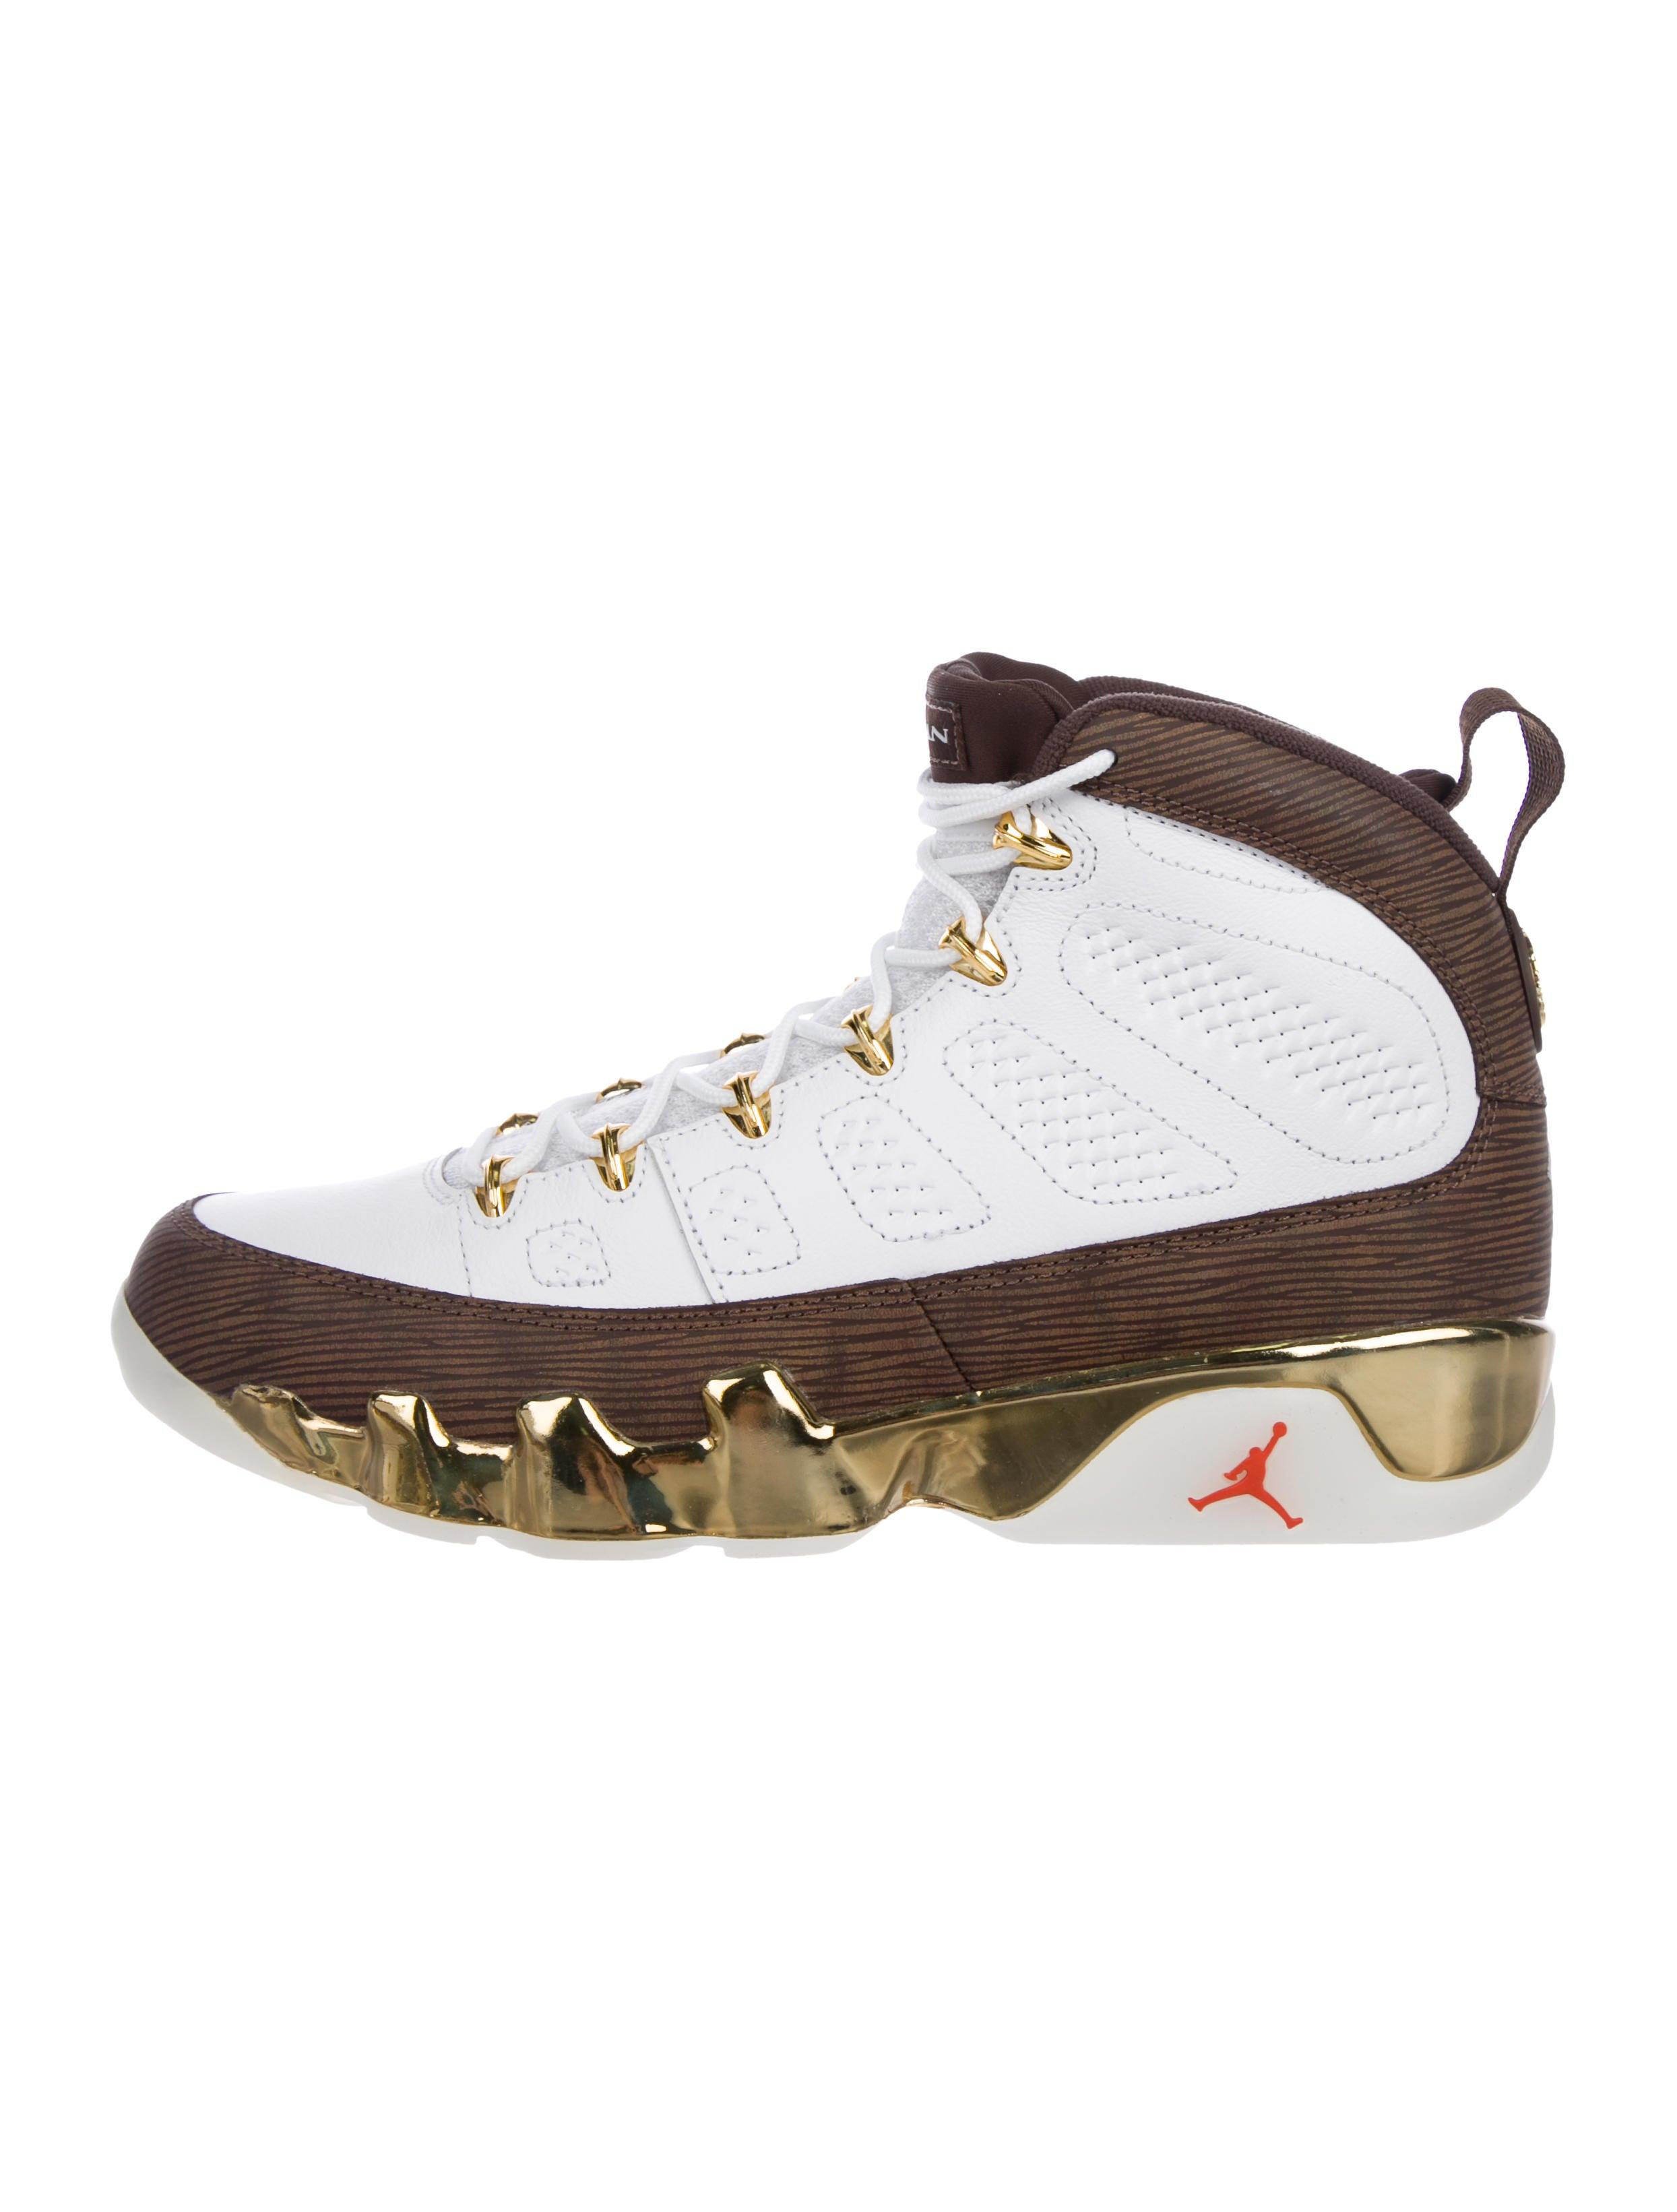 542939af9f2b Nike Air Jordan 9 Retro Mop Melo Sneakers - Shoes - WNIAJ21618